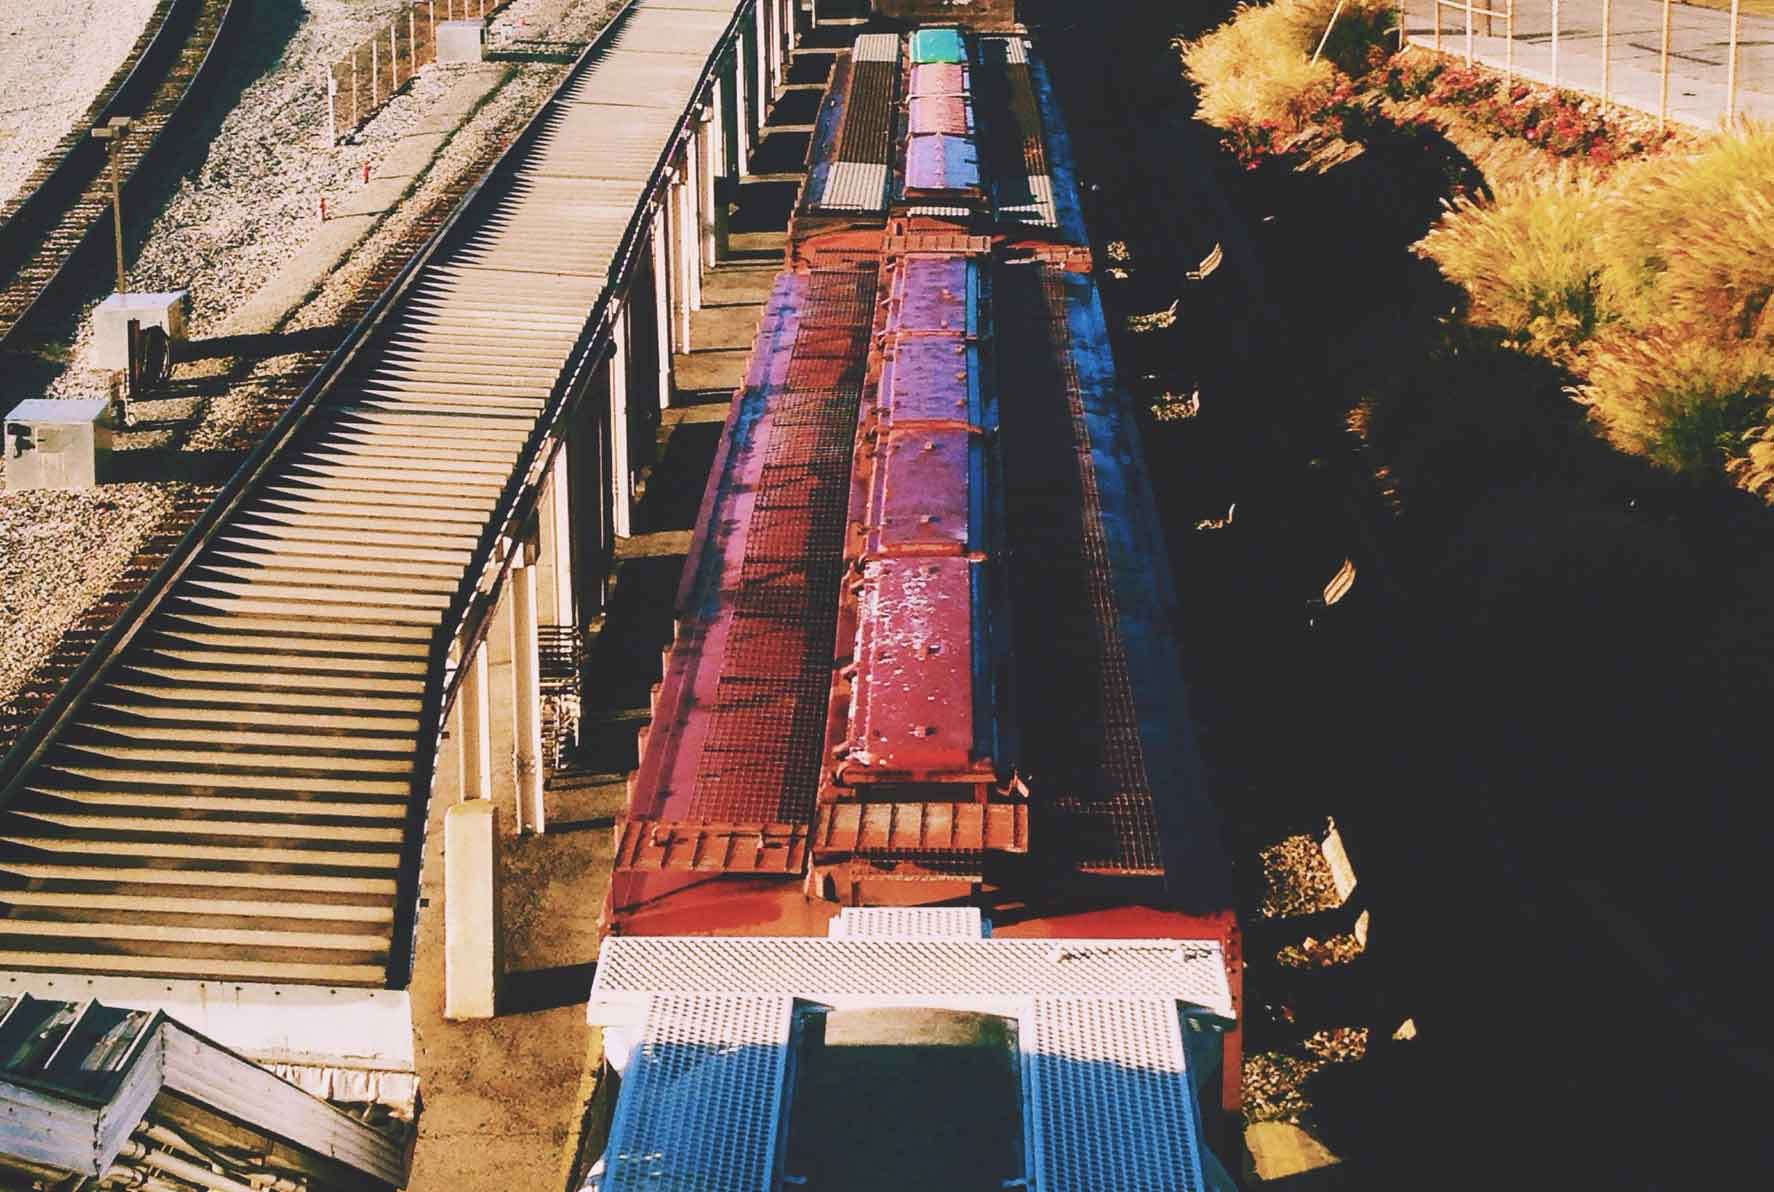 Boxcars on tracks